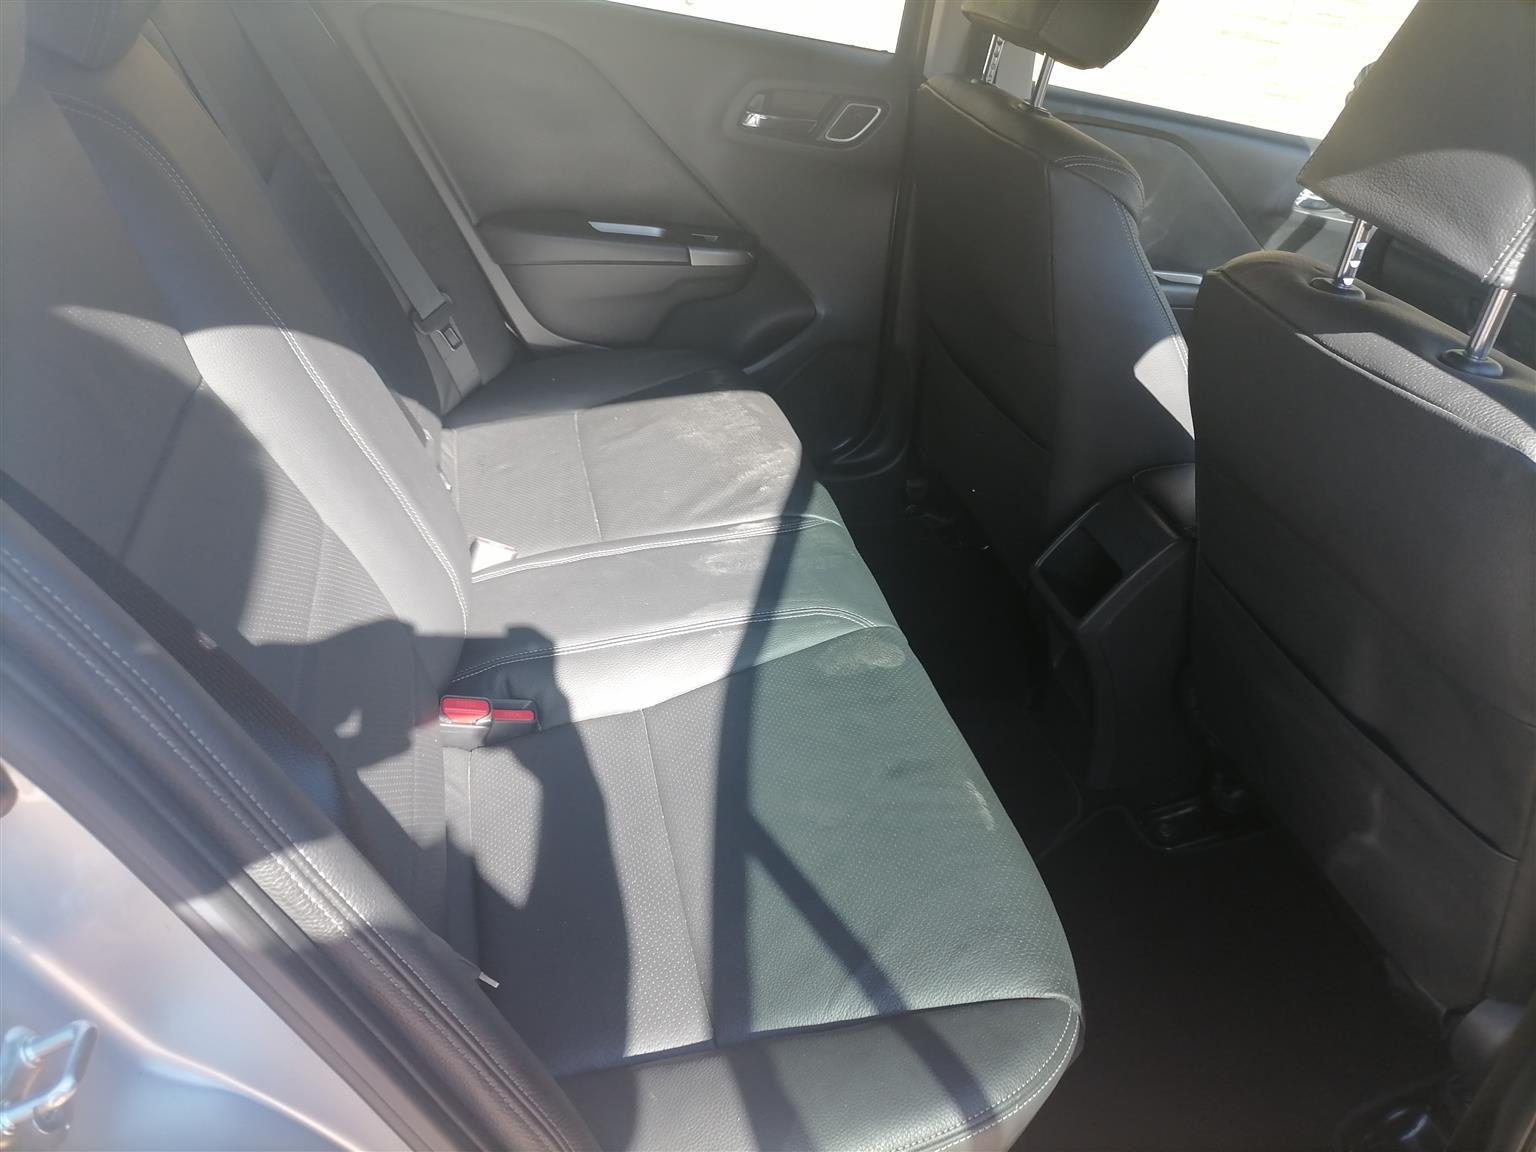 2018 Honda Ballade 1.5 Elegance Automatic,